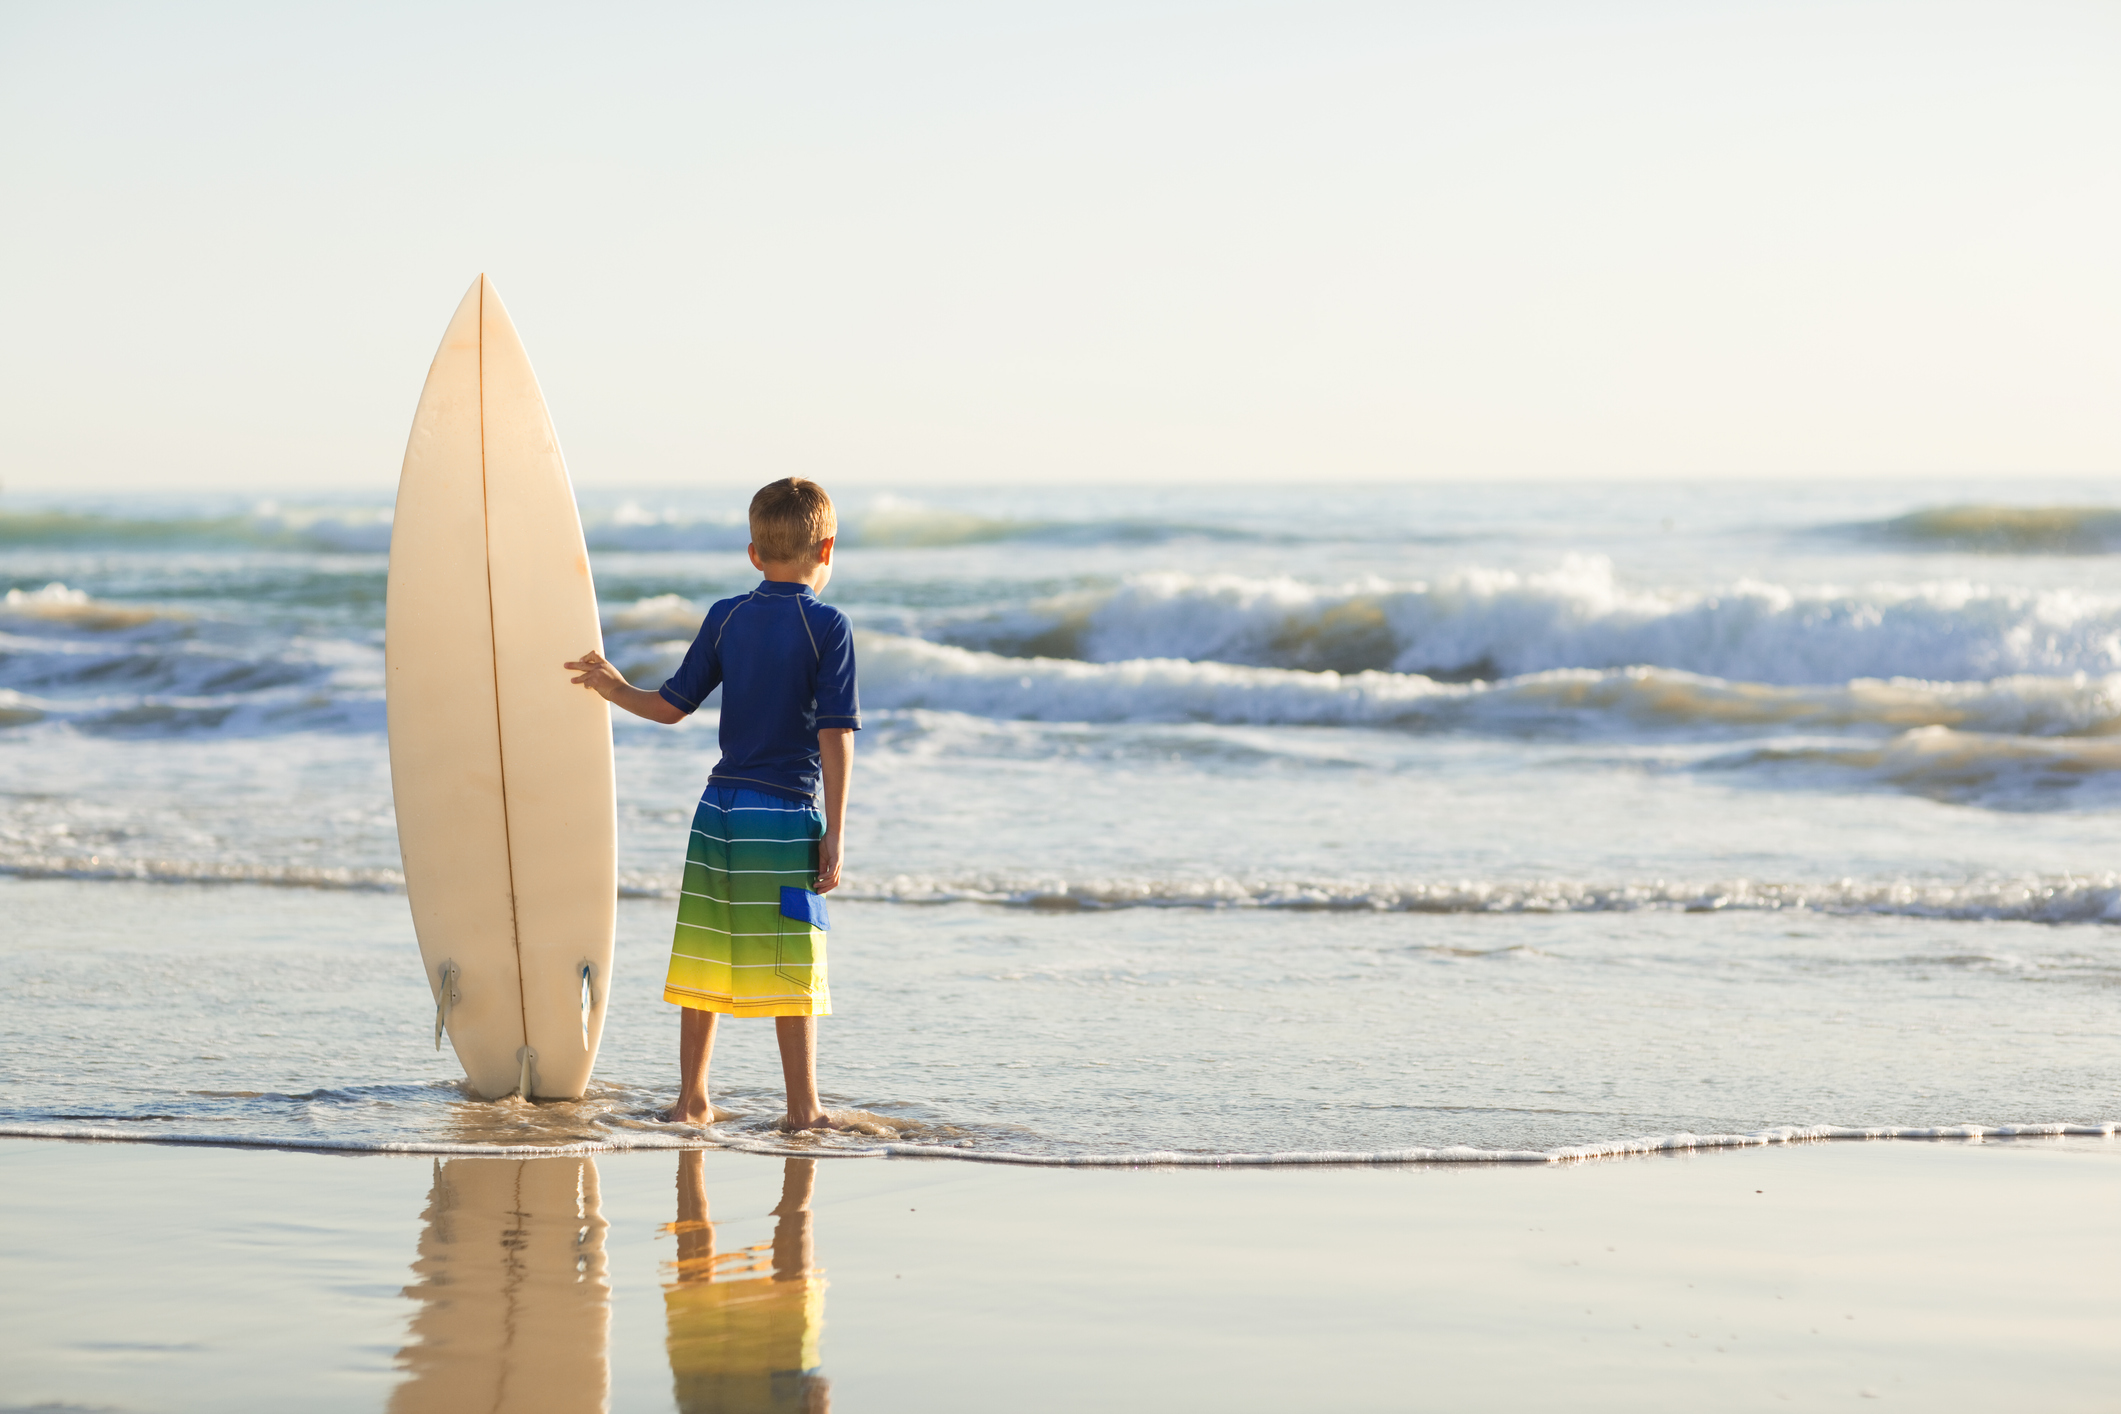 A little boy holds a surfboard on a California beach.